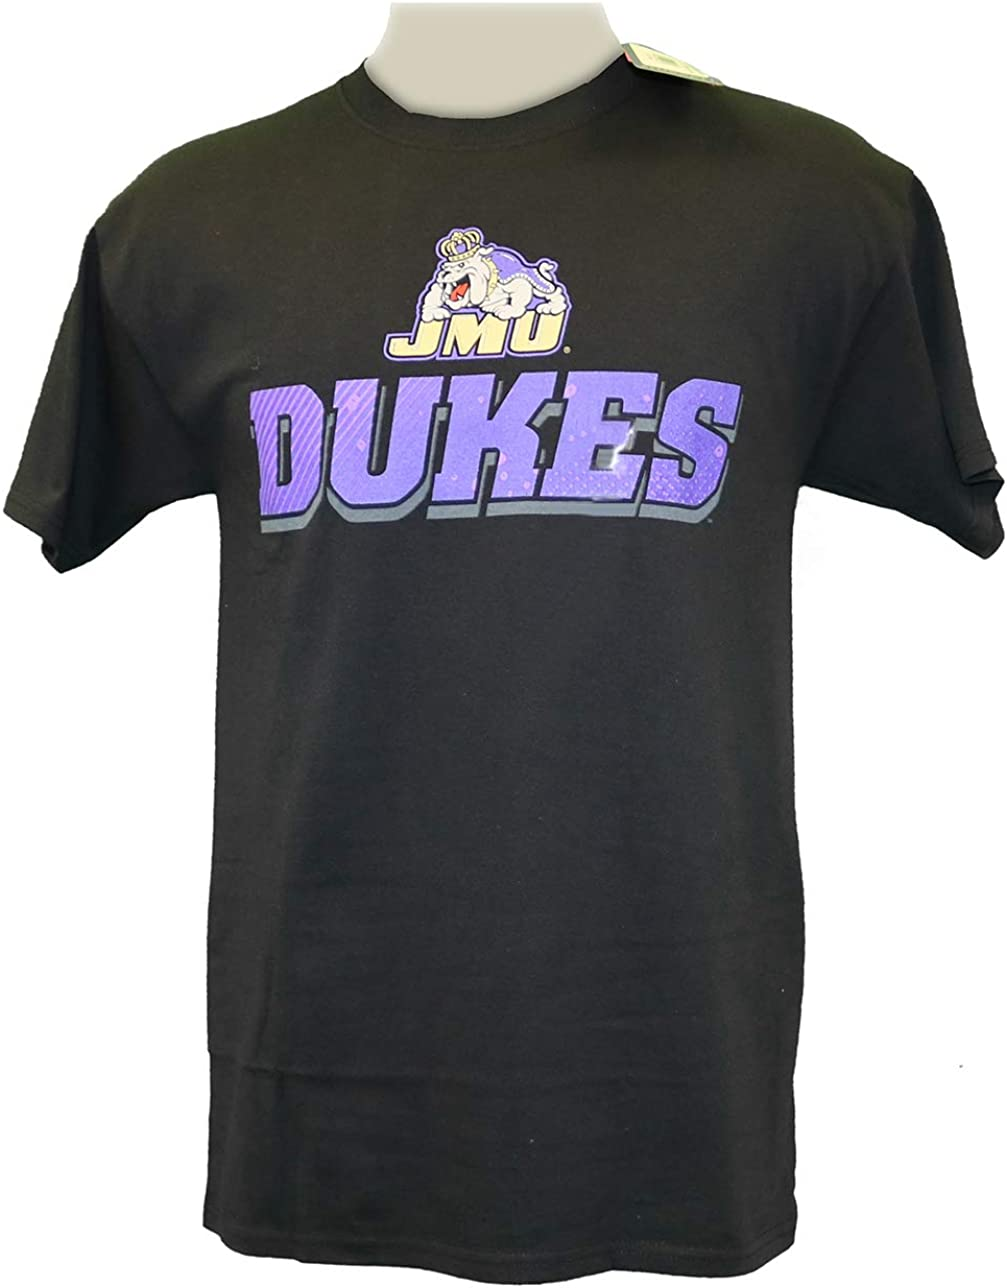 Black RussellApparel NCAA James Madison University Mens 1908 Dukes Cotton Crew Neck Tee